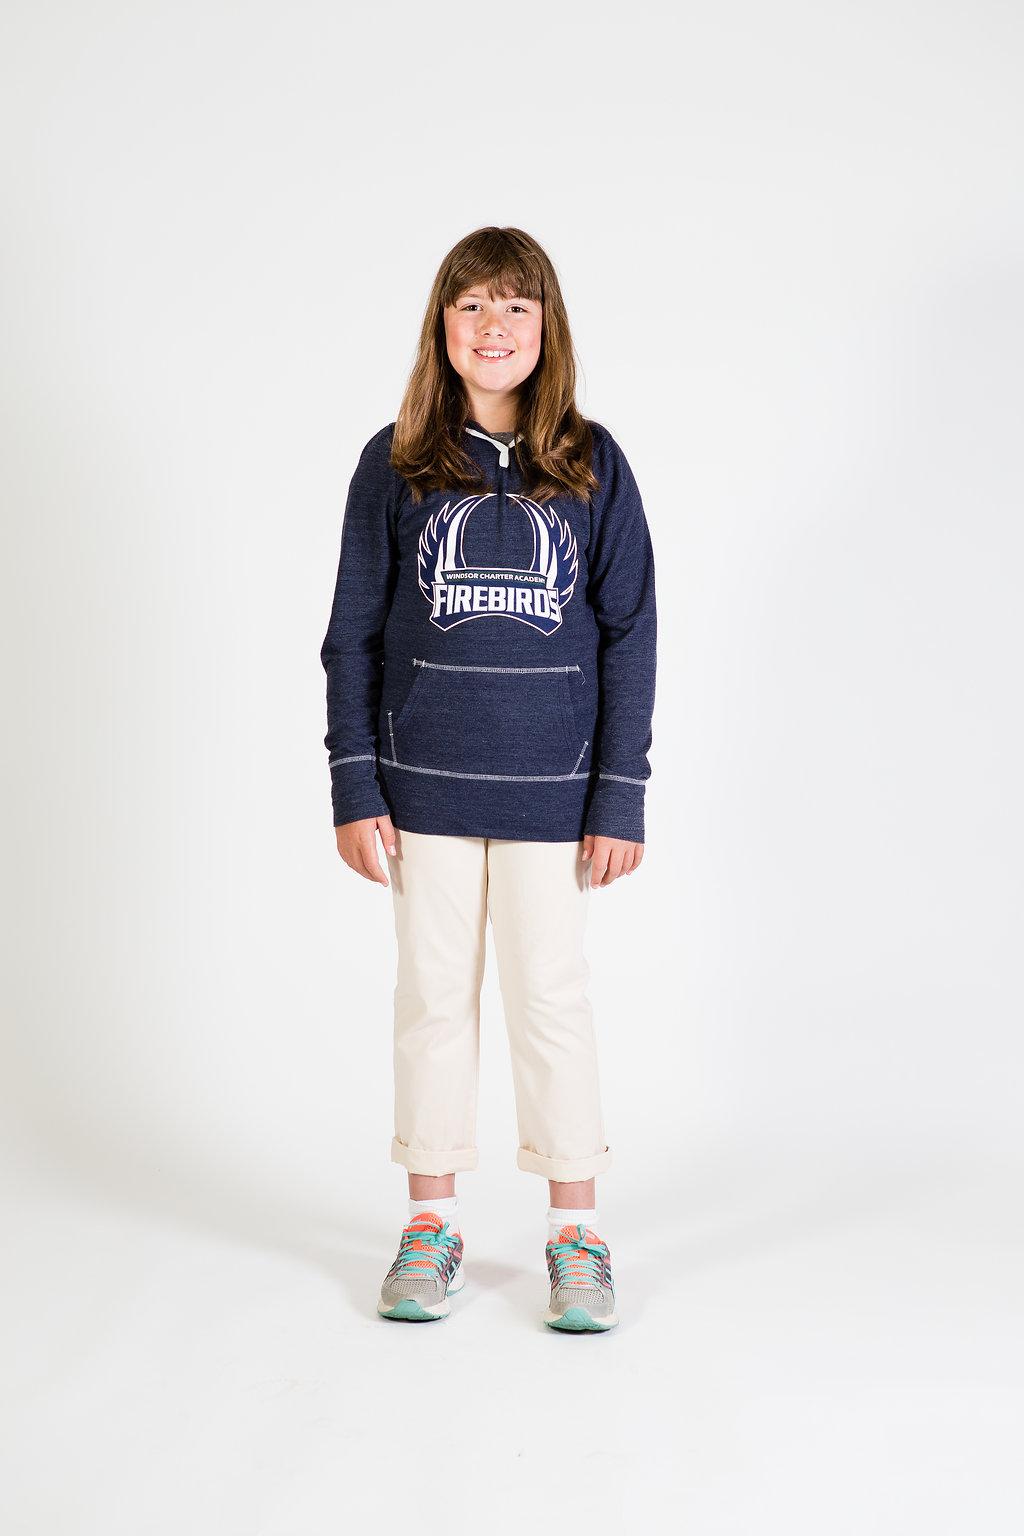 16JuneWCA_Uniforms049-Edit.jpg